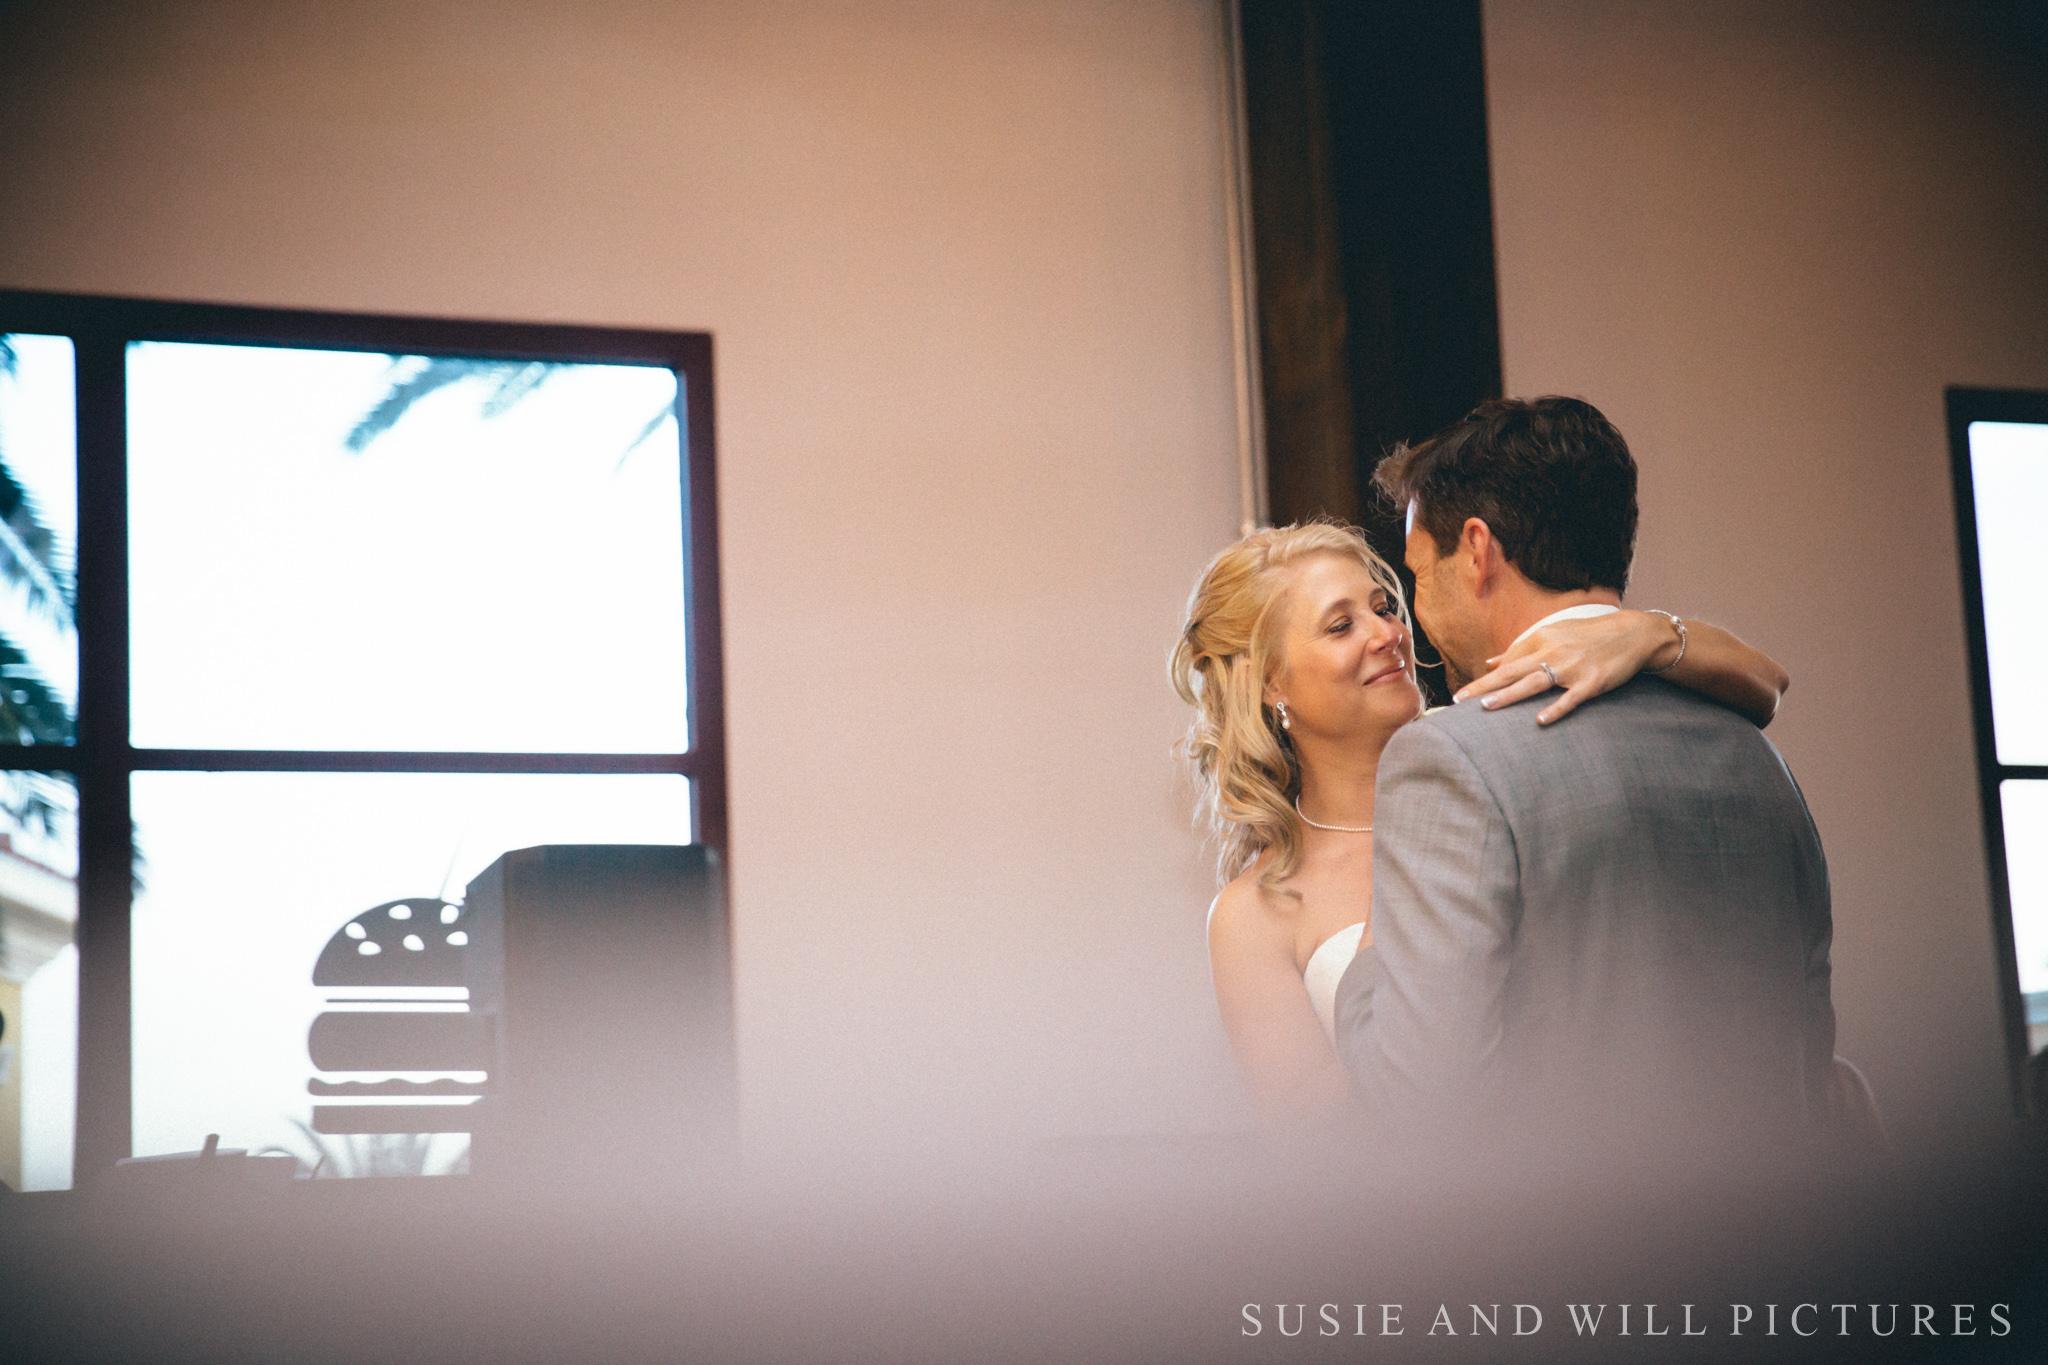 #weddingplannerlasvegas,#lasvegasweddingcoordinators,#weddingcoordinatorslasvegas,#weddingcoordinatorlasvegas,#lasvegasweddingplanner #desirableeventsbydesi #Tropicanawedding #wedding, #love, #lovewins, #samesexwedding, #gaywedding, #tropicana, #lasvegaswedding, #weddinglasvegas, #weddingplannerslasvegas, #lasvegasweddingplanners, #worldmarketcenter, #susieandwill, #elegantwedding, #myloandshino, #lasvegas, #weddingslv, #lvweddingplanners, #tivolivillage, #tivolivillagewedding, #weddingtivolivillage